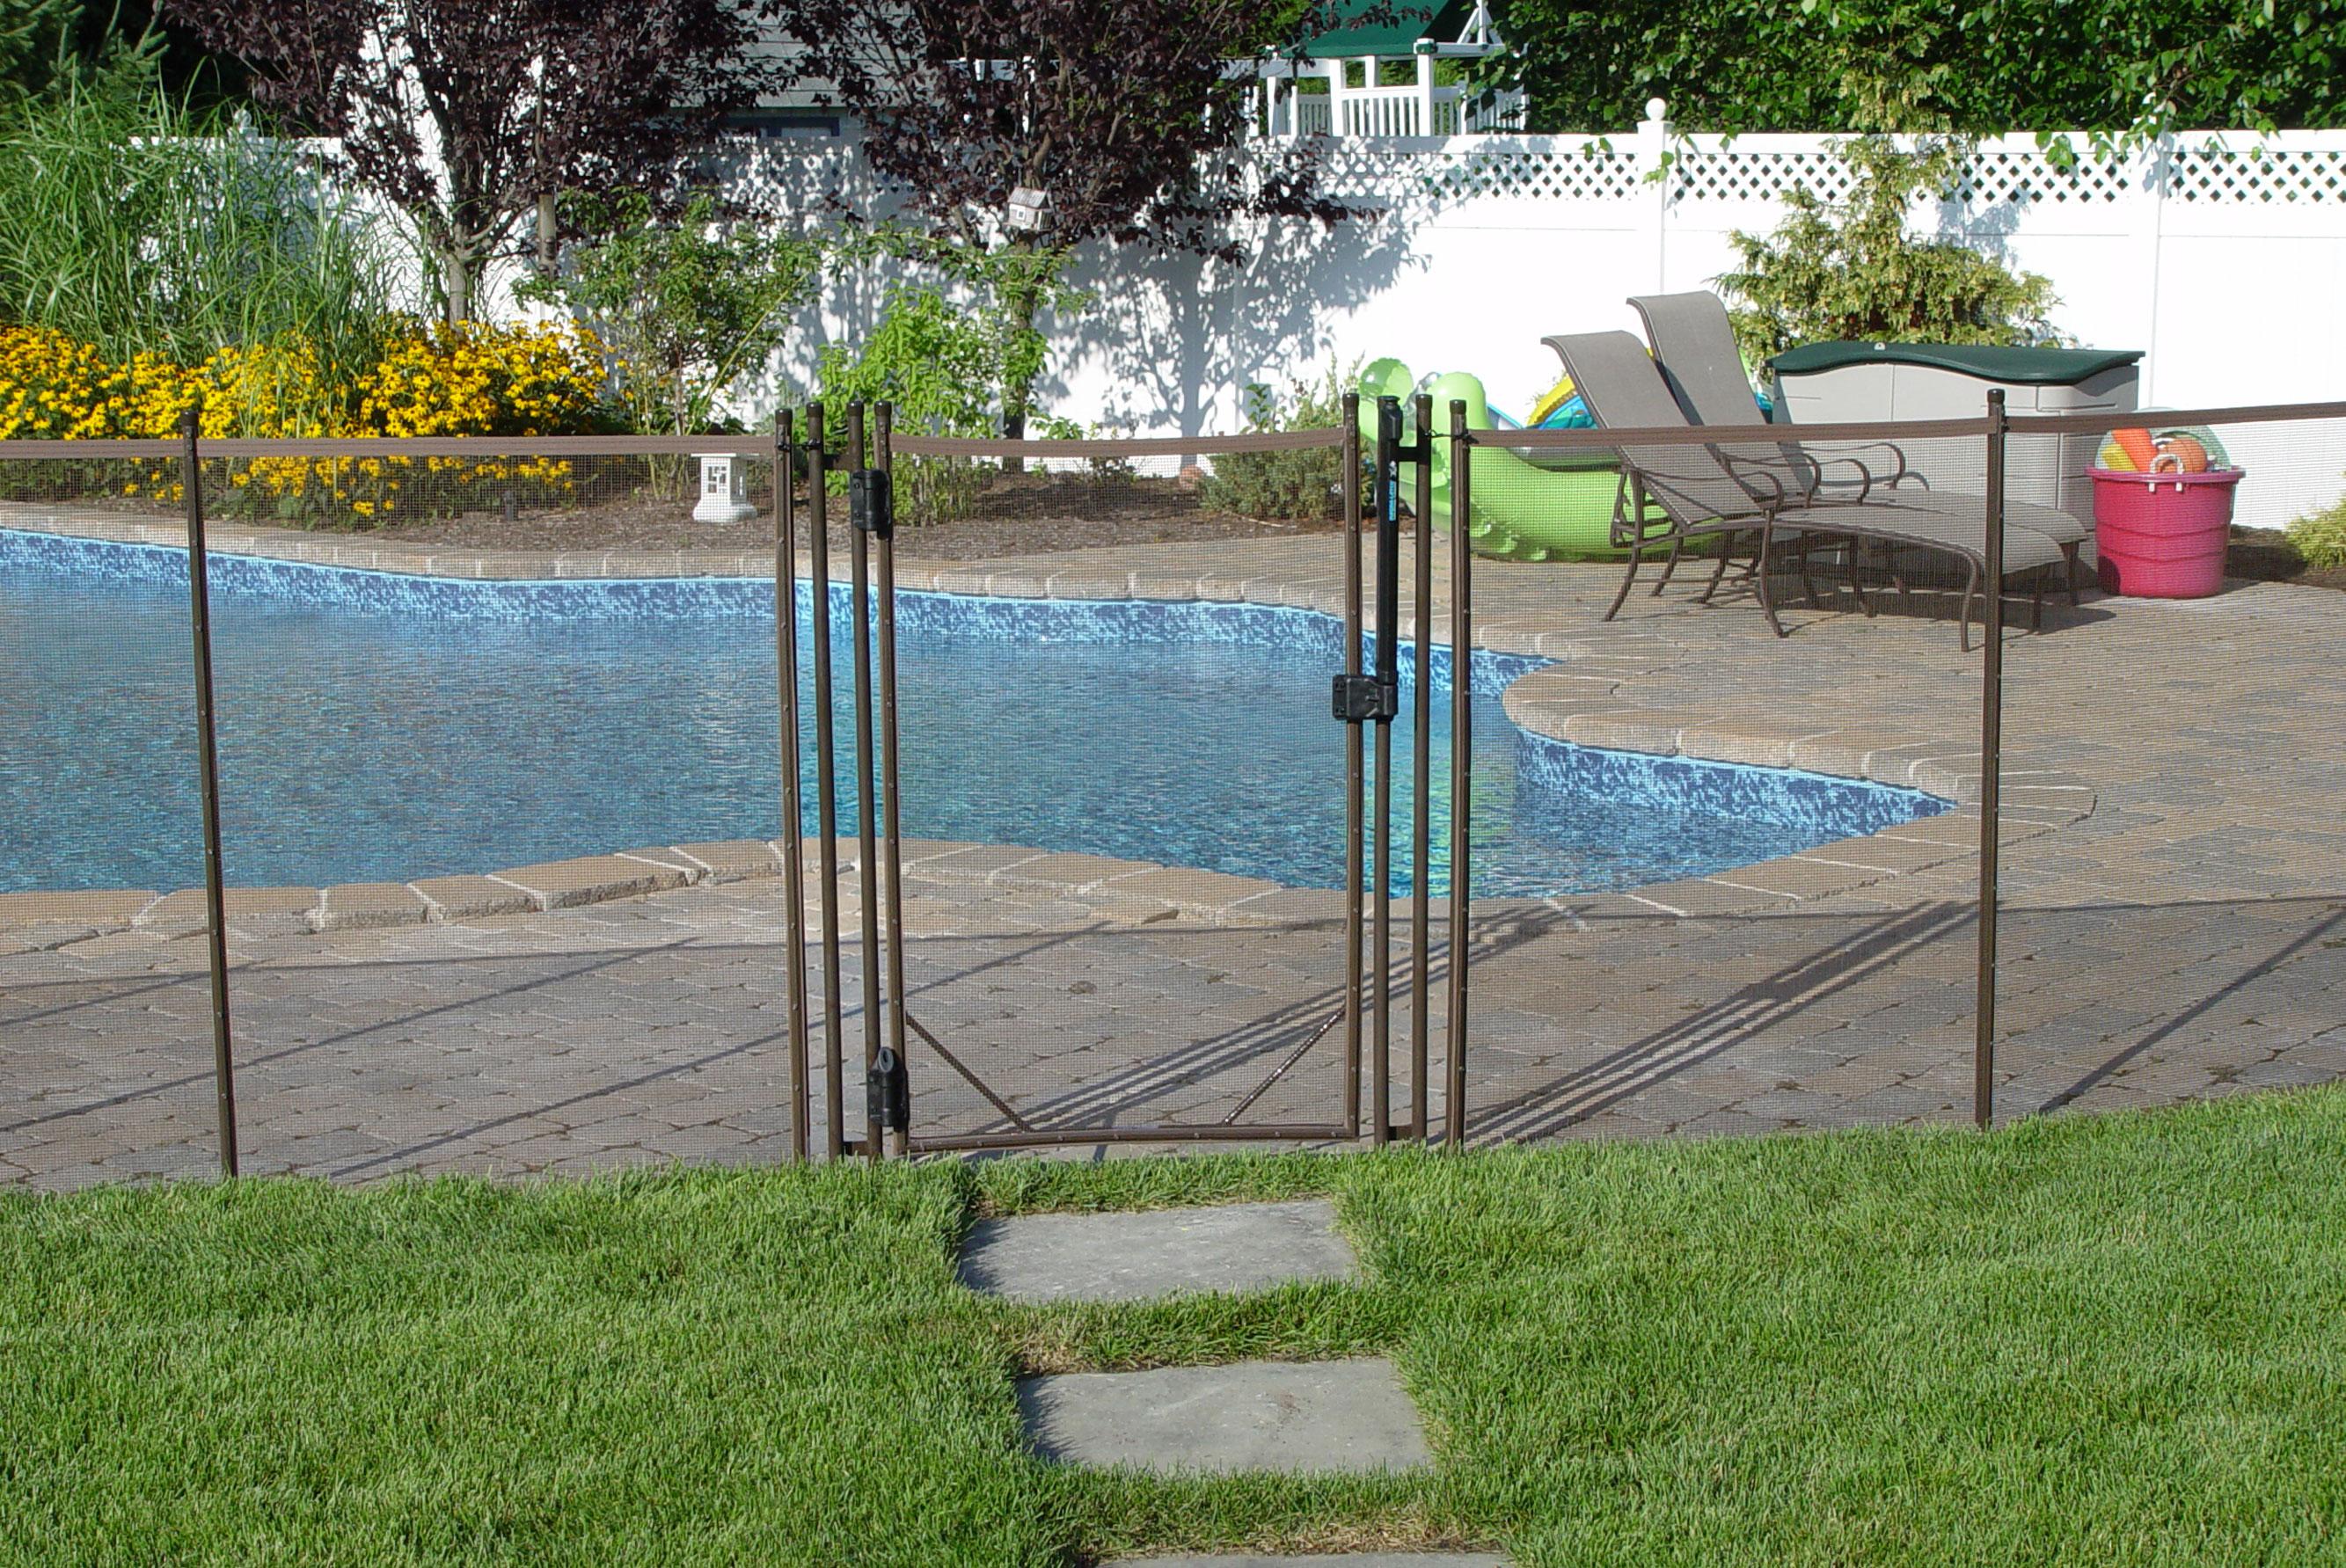 Pool safety fence fences